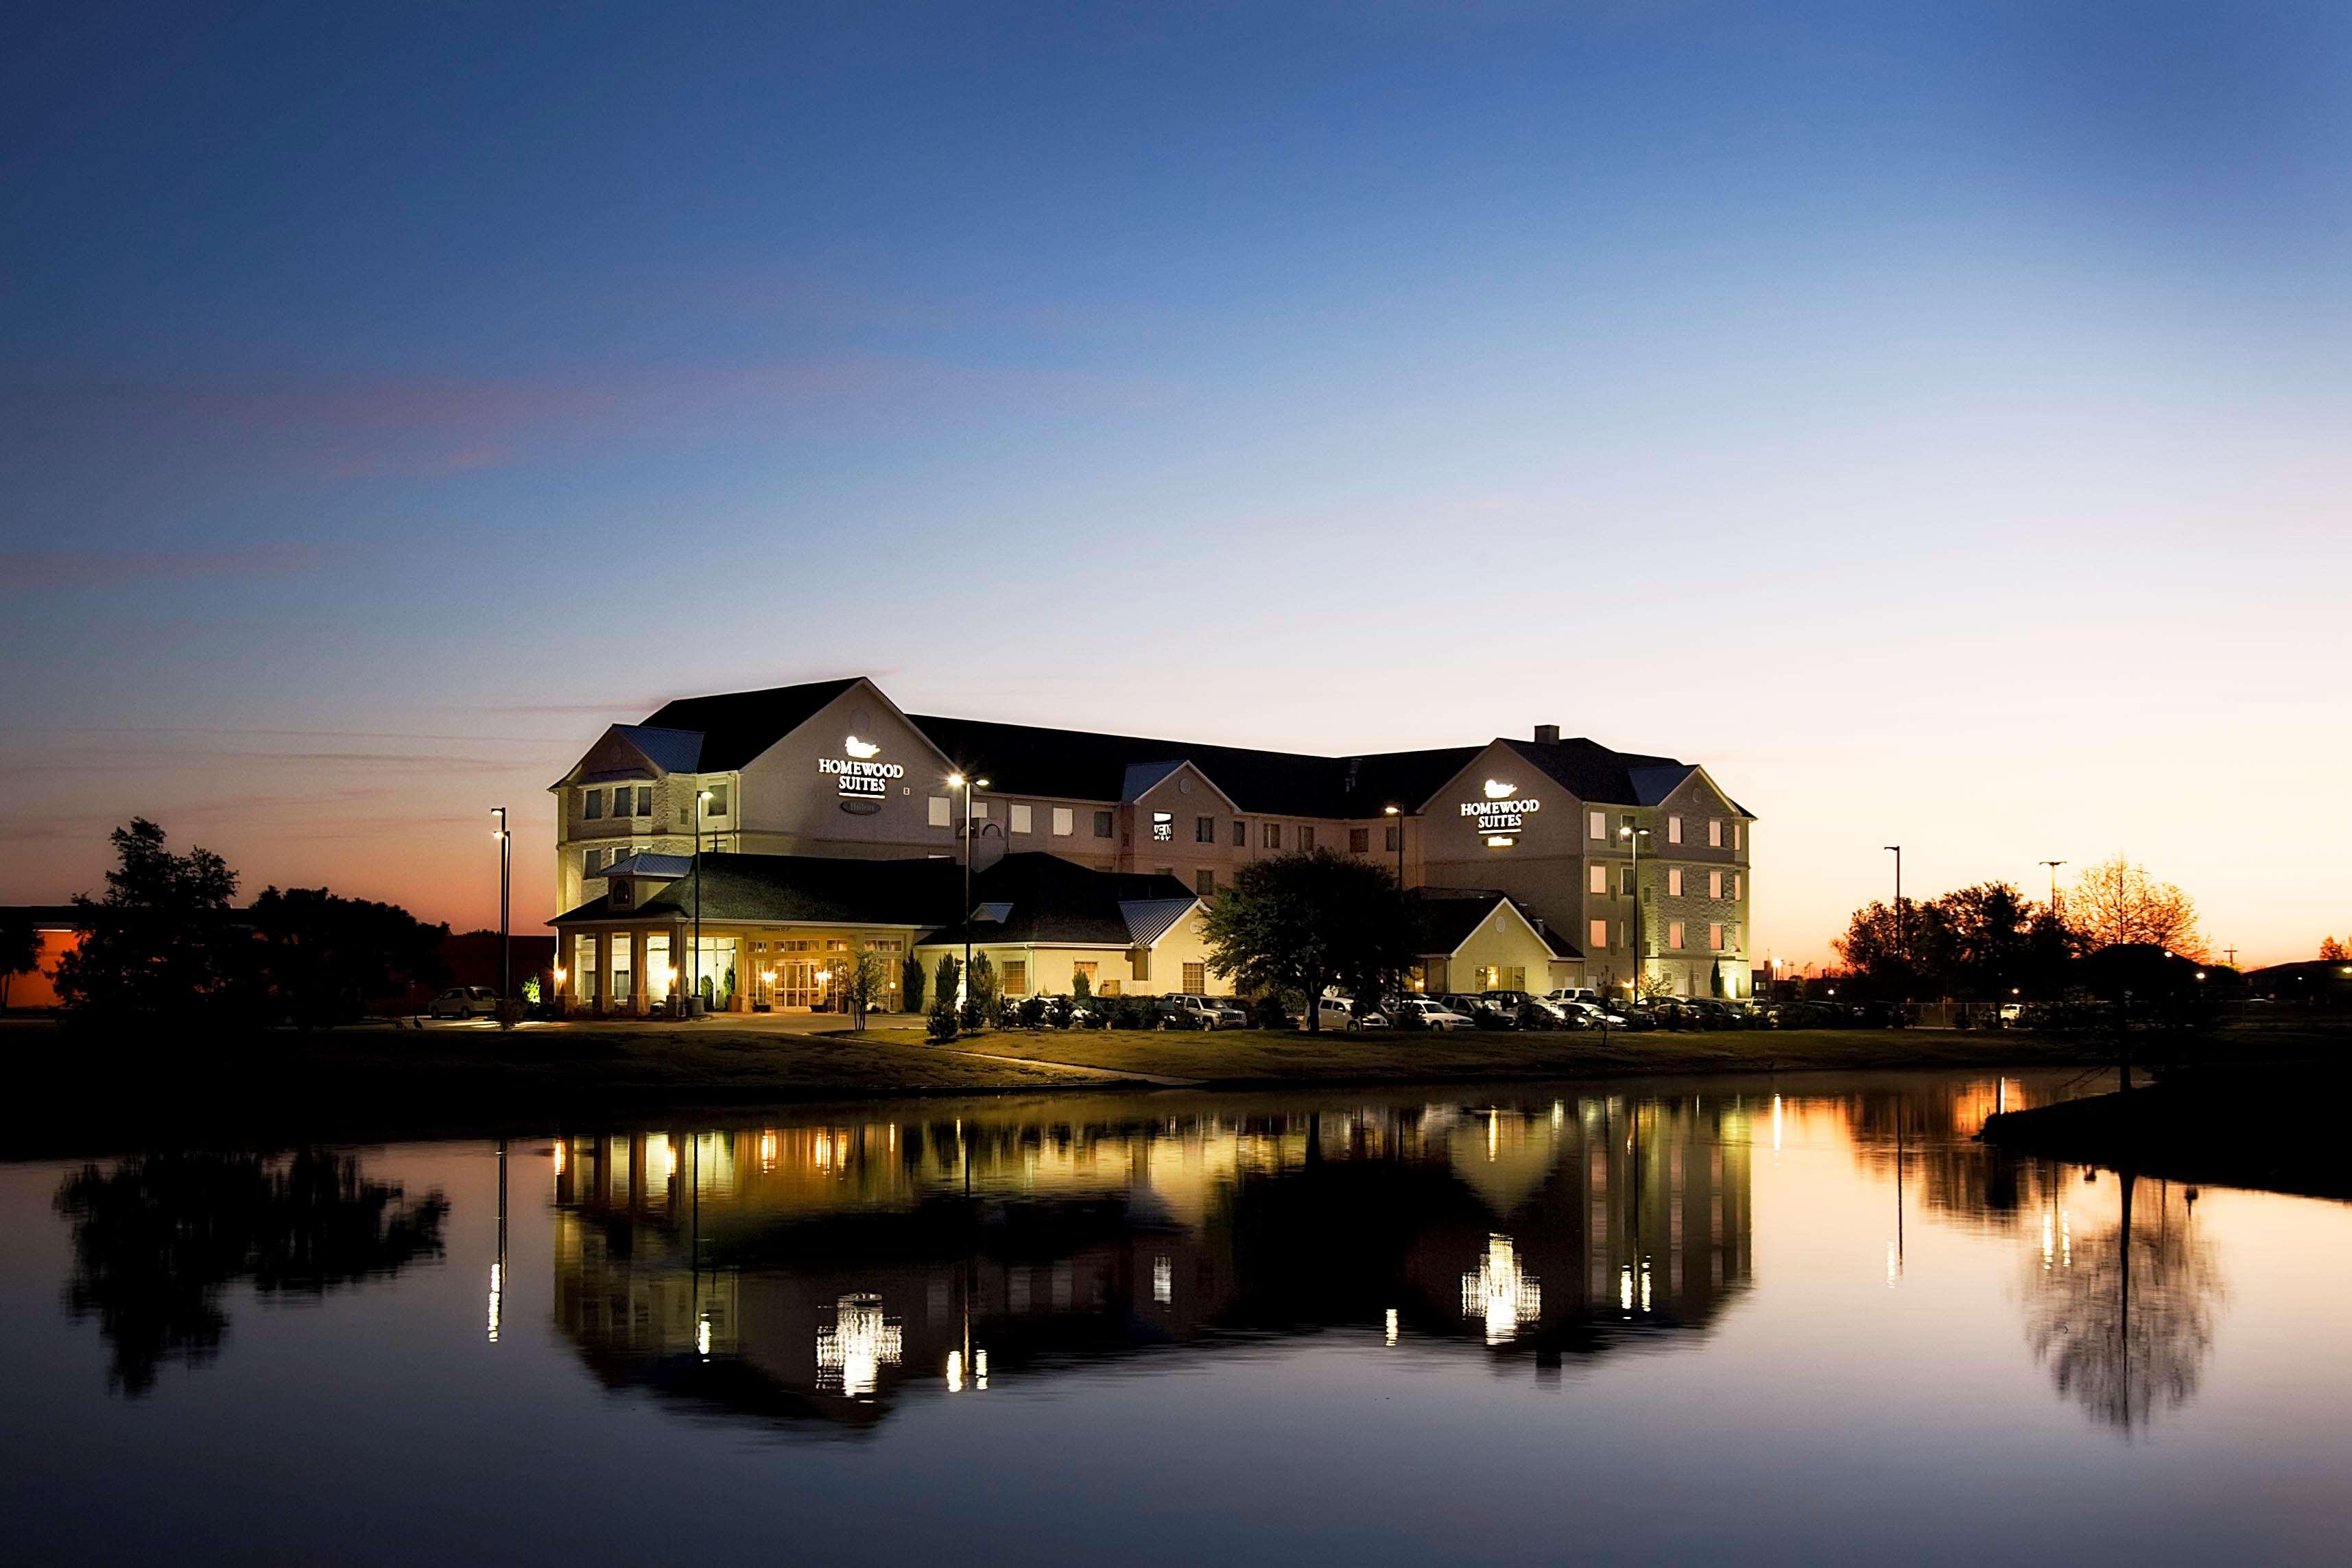 Homewood Suites by Hilton Wichita Falls image 2